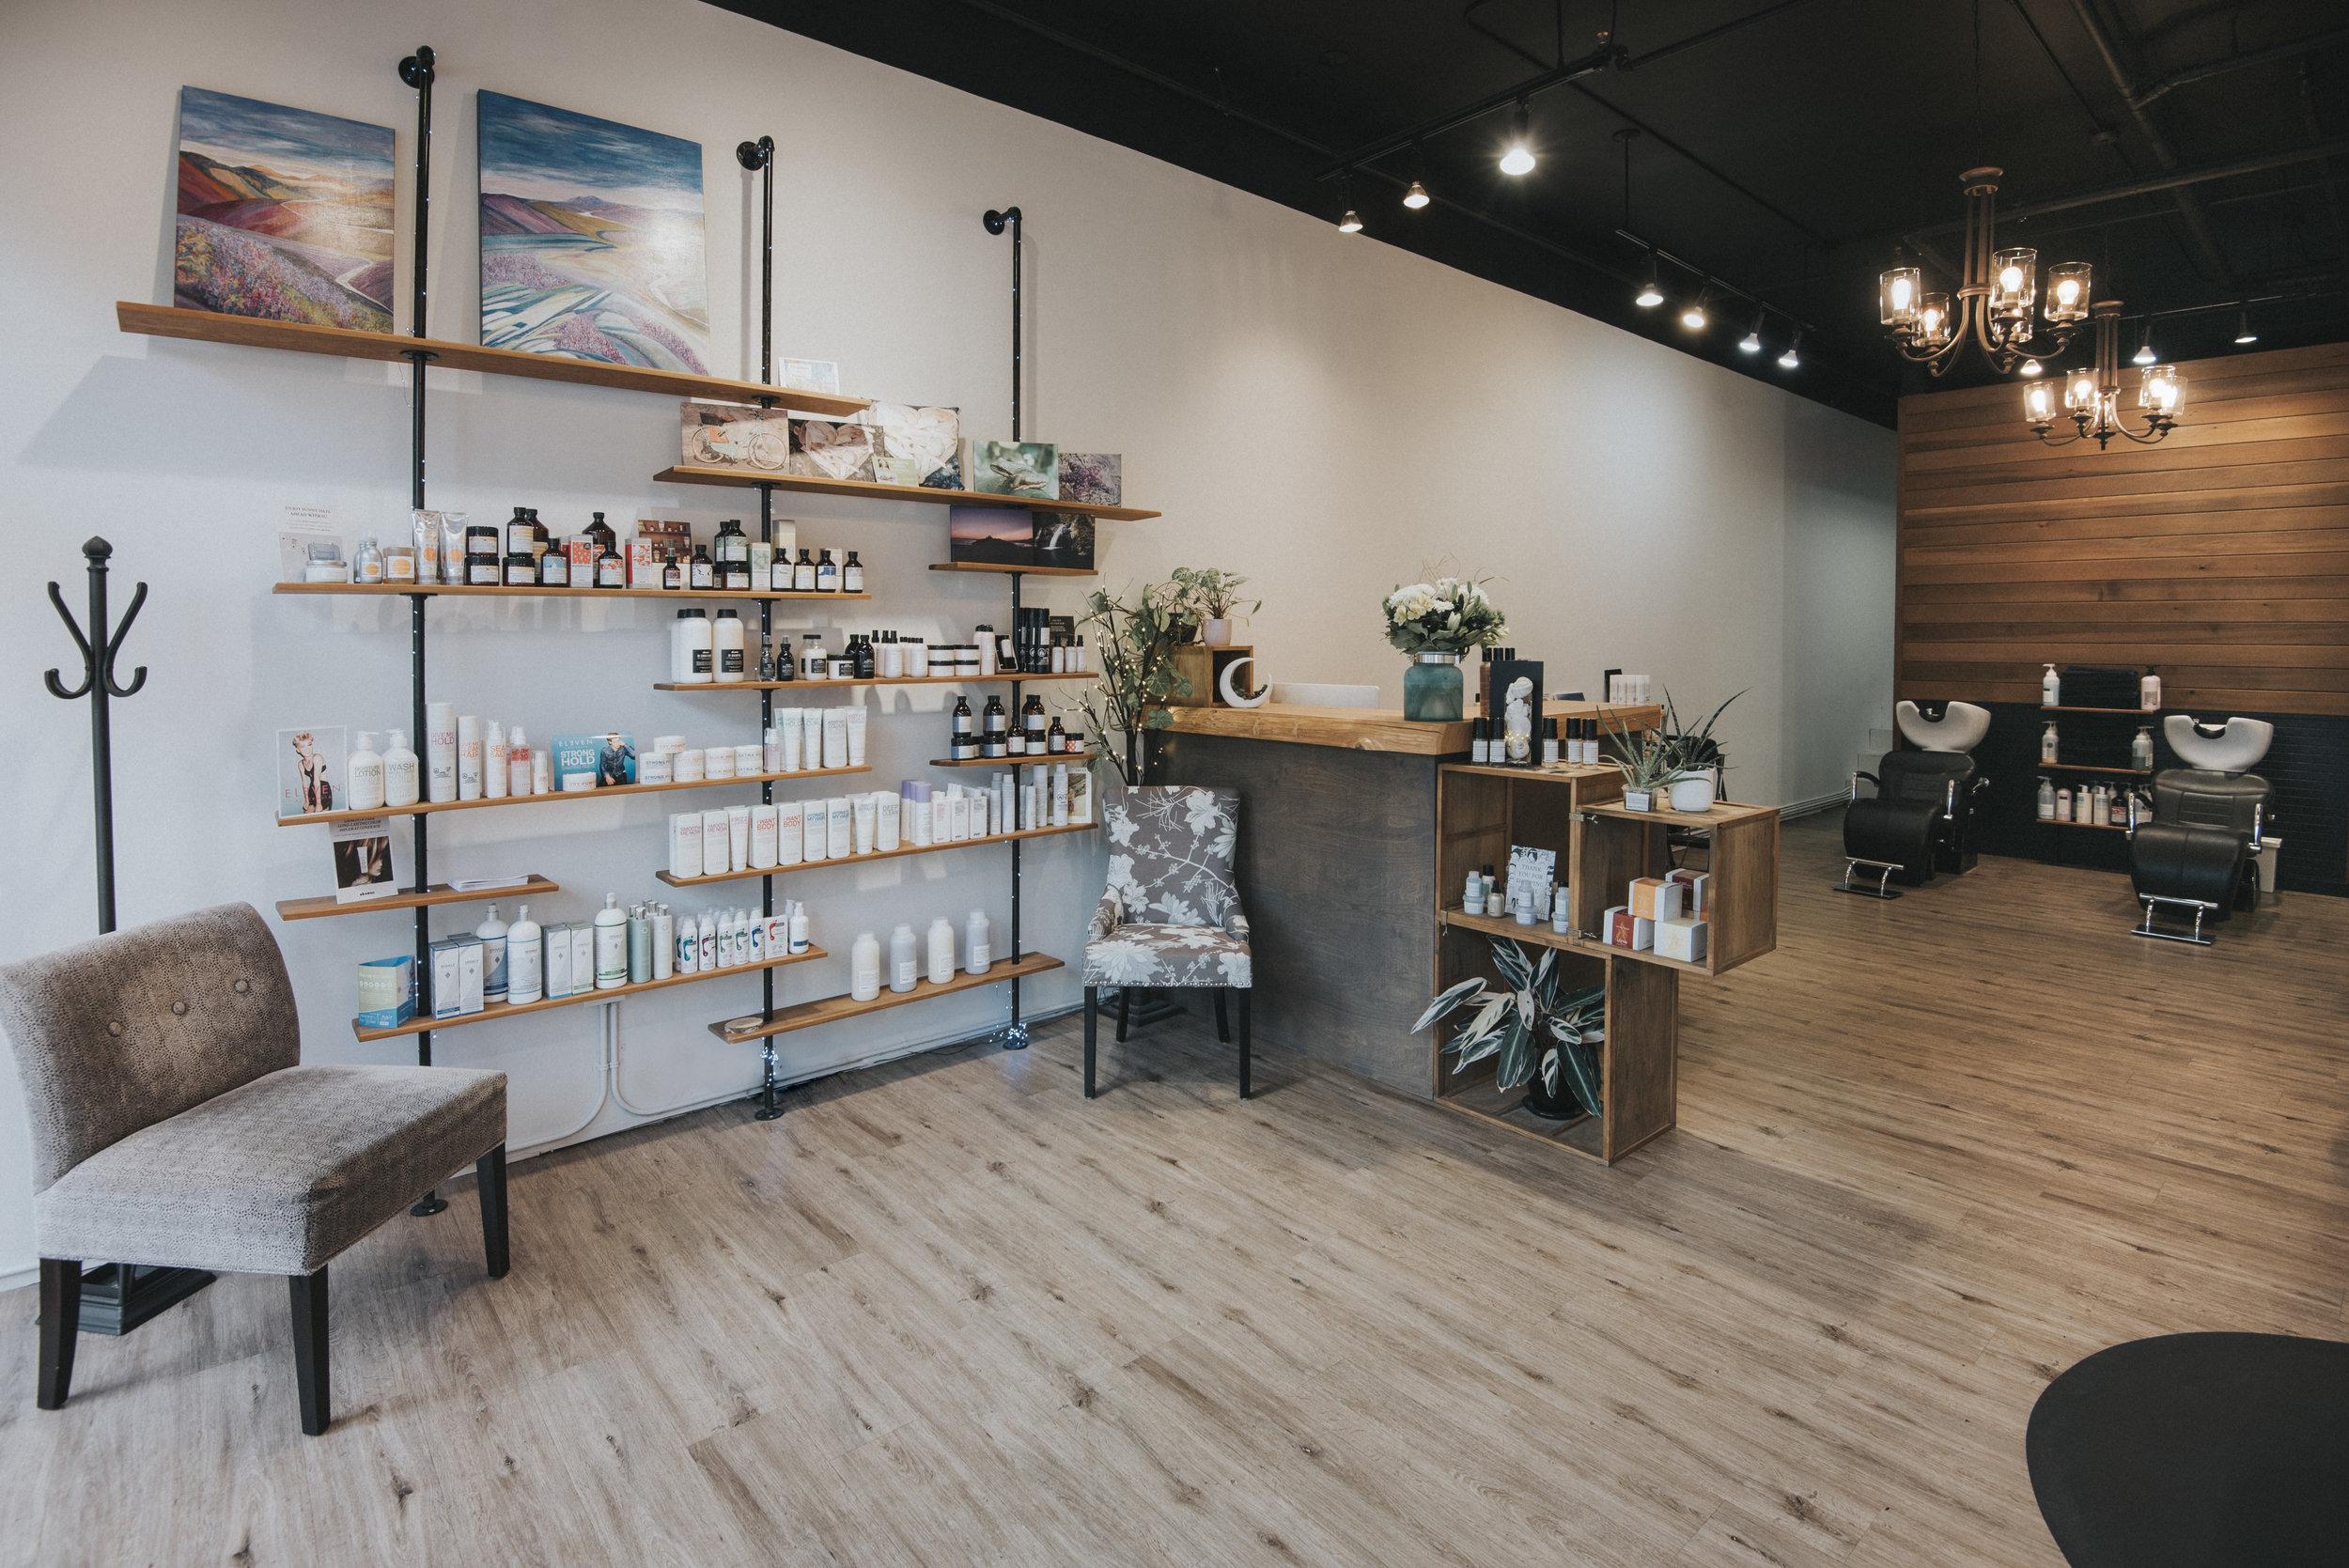 Melanie Orr Photography - Belle's Haircare Boutique Salon -.jpg